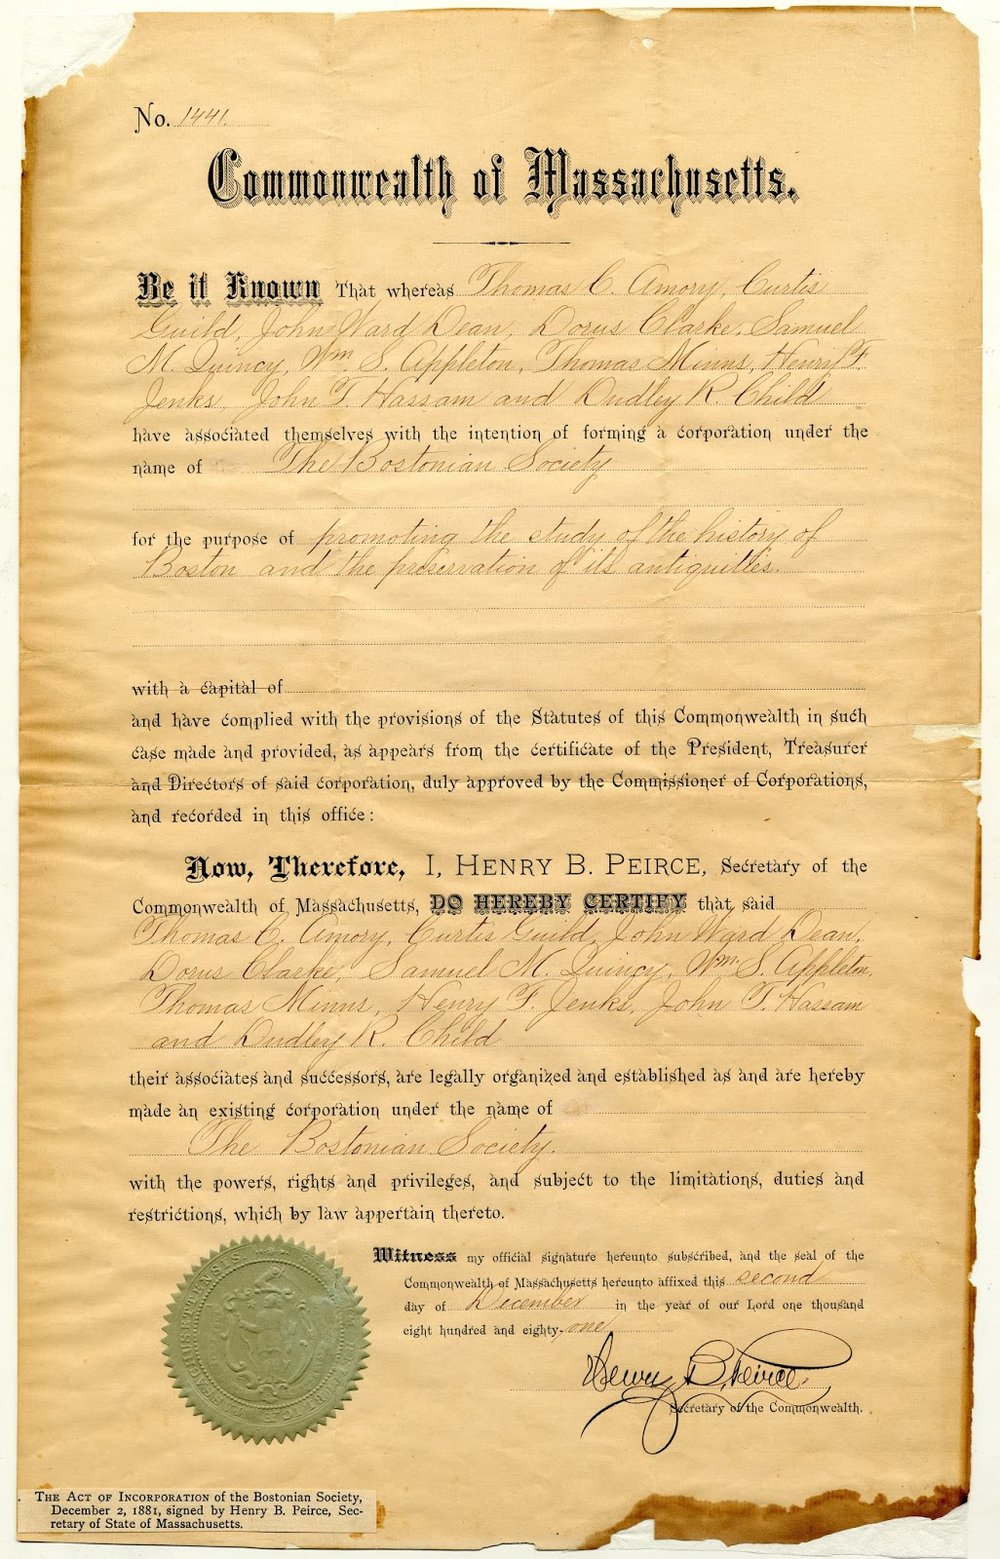 Bostonian Society Charter, 1881